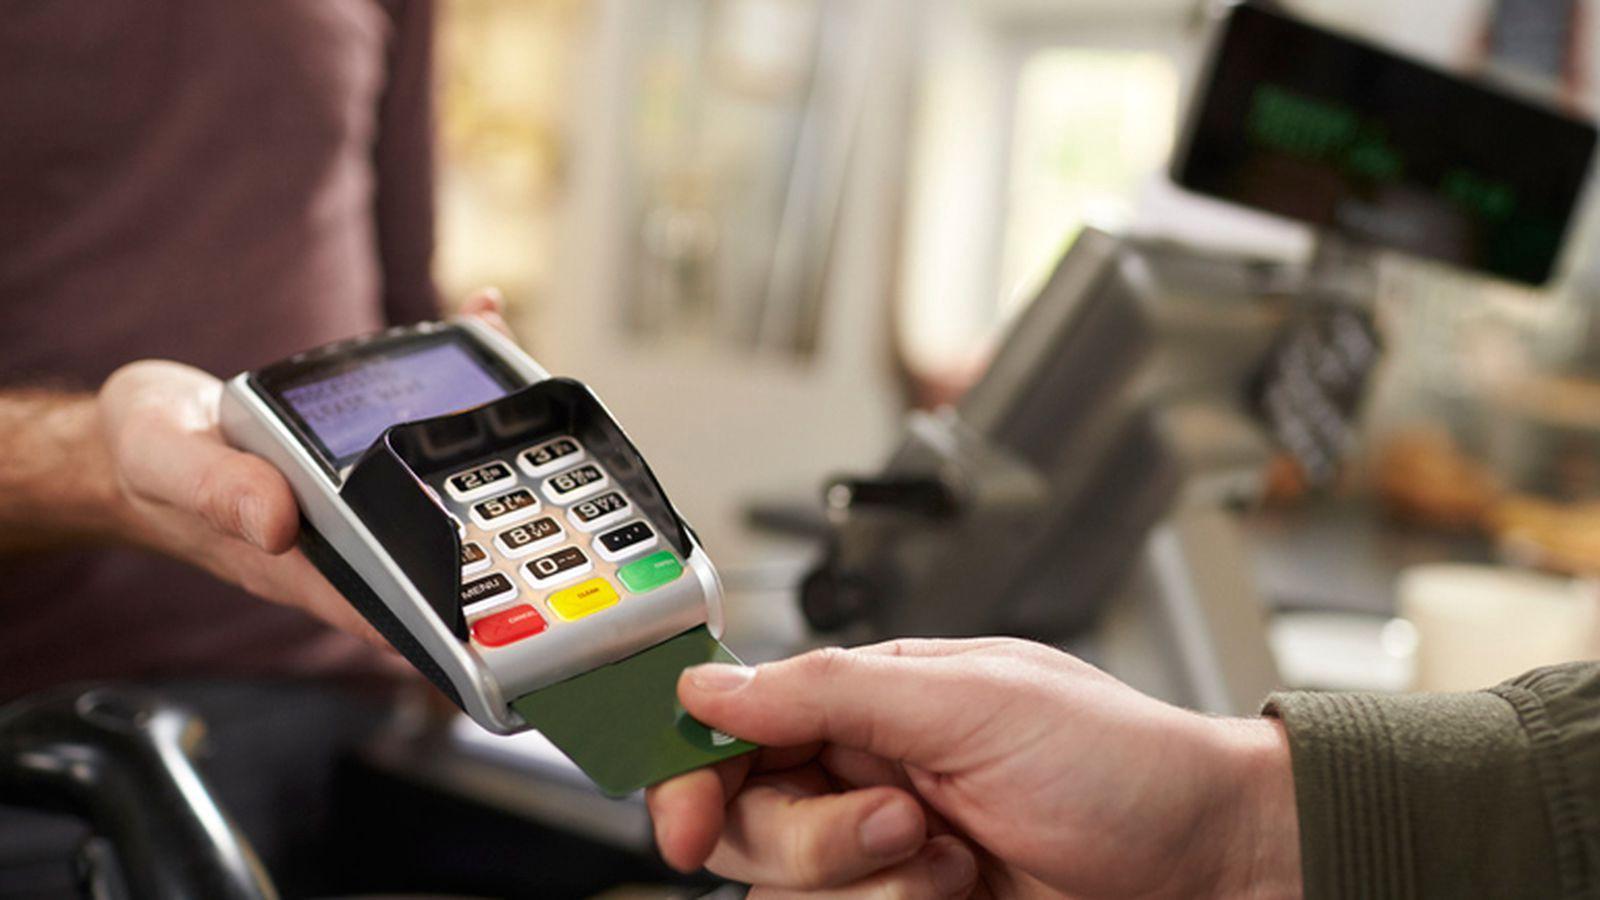 apmaksa ar elektronisko naudu